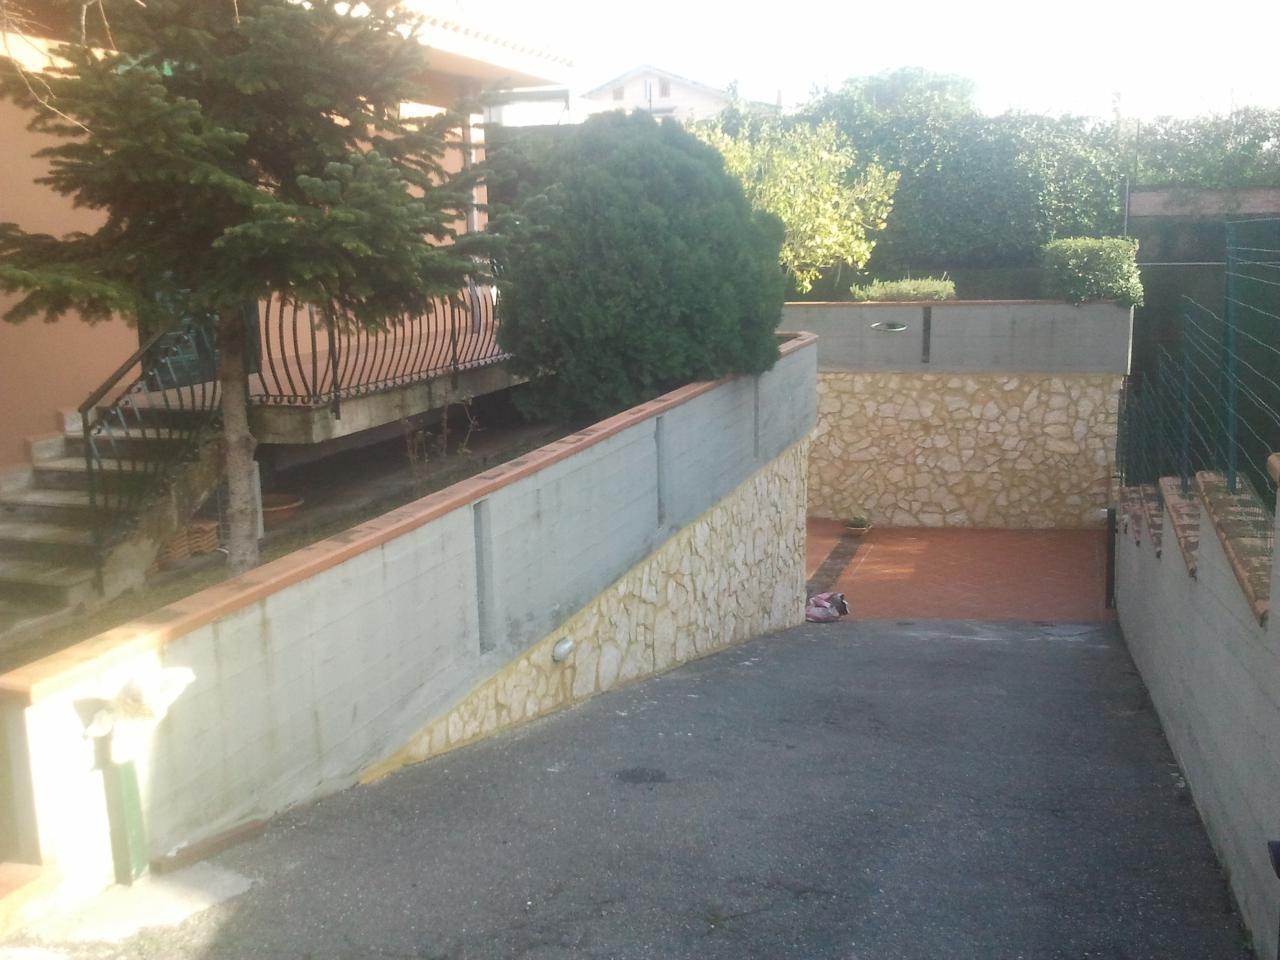 Appartement de vacances ZUHAUSE VON EMILIA - zwischen Ätna und Taormina (1743739), Aci Sant'Antonio, Catania, Sicile, Italie, image 9